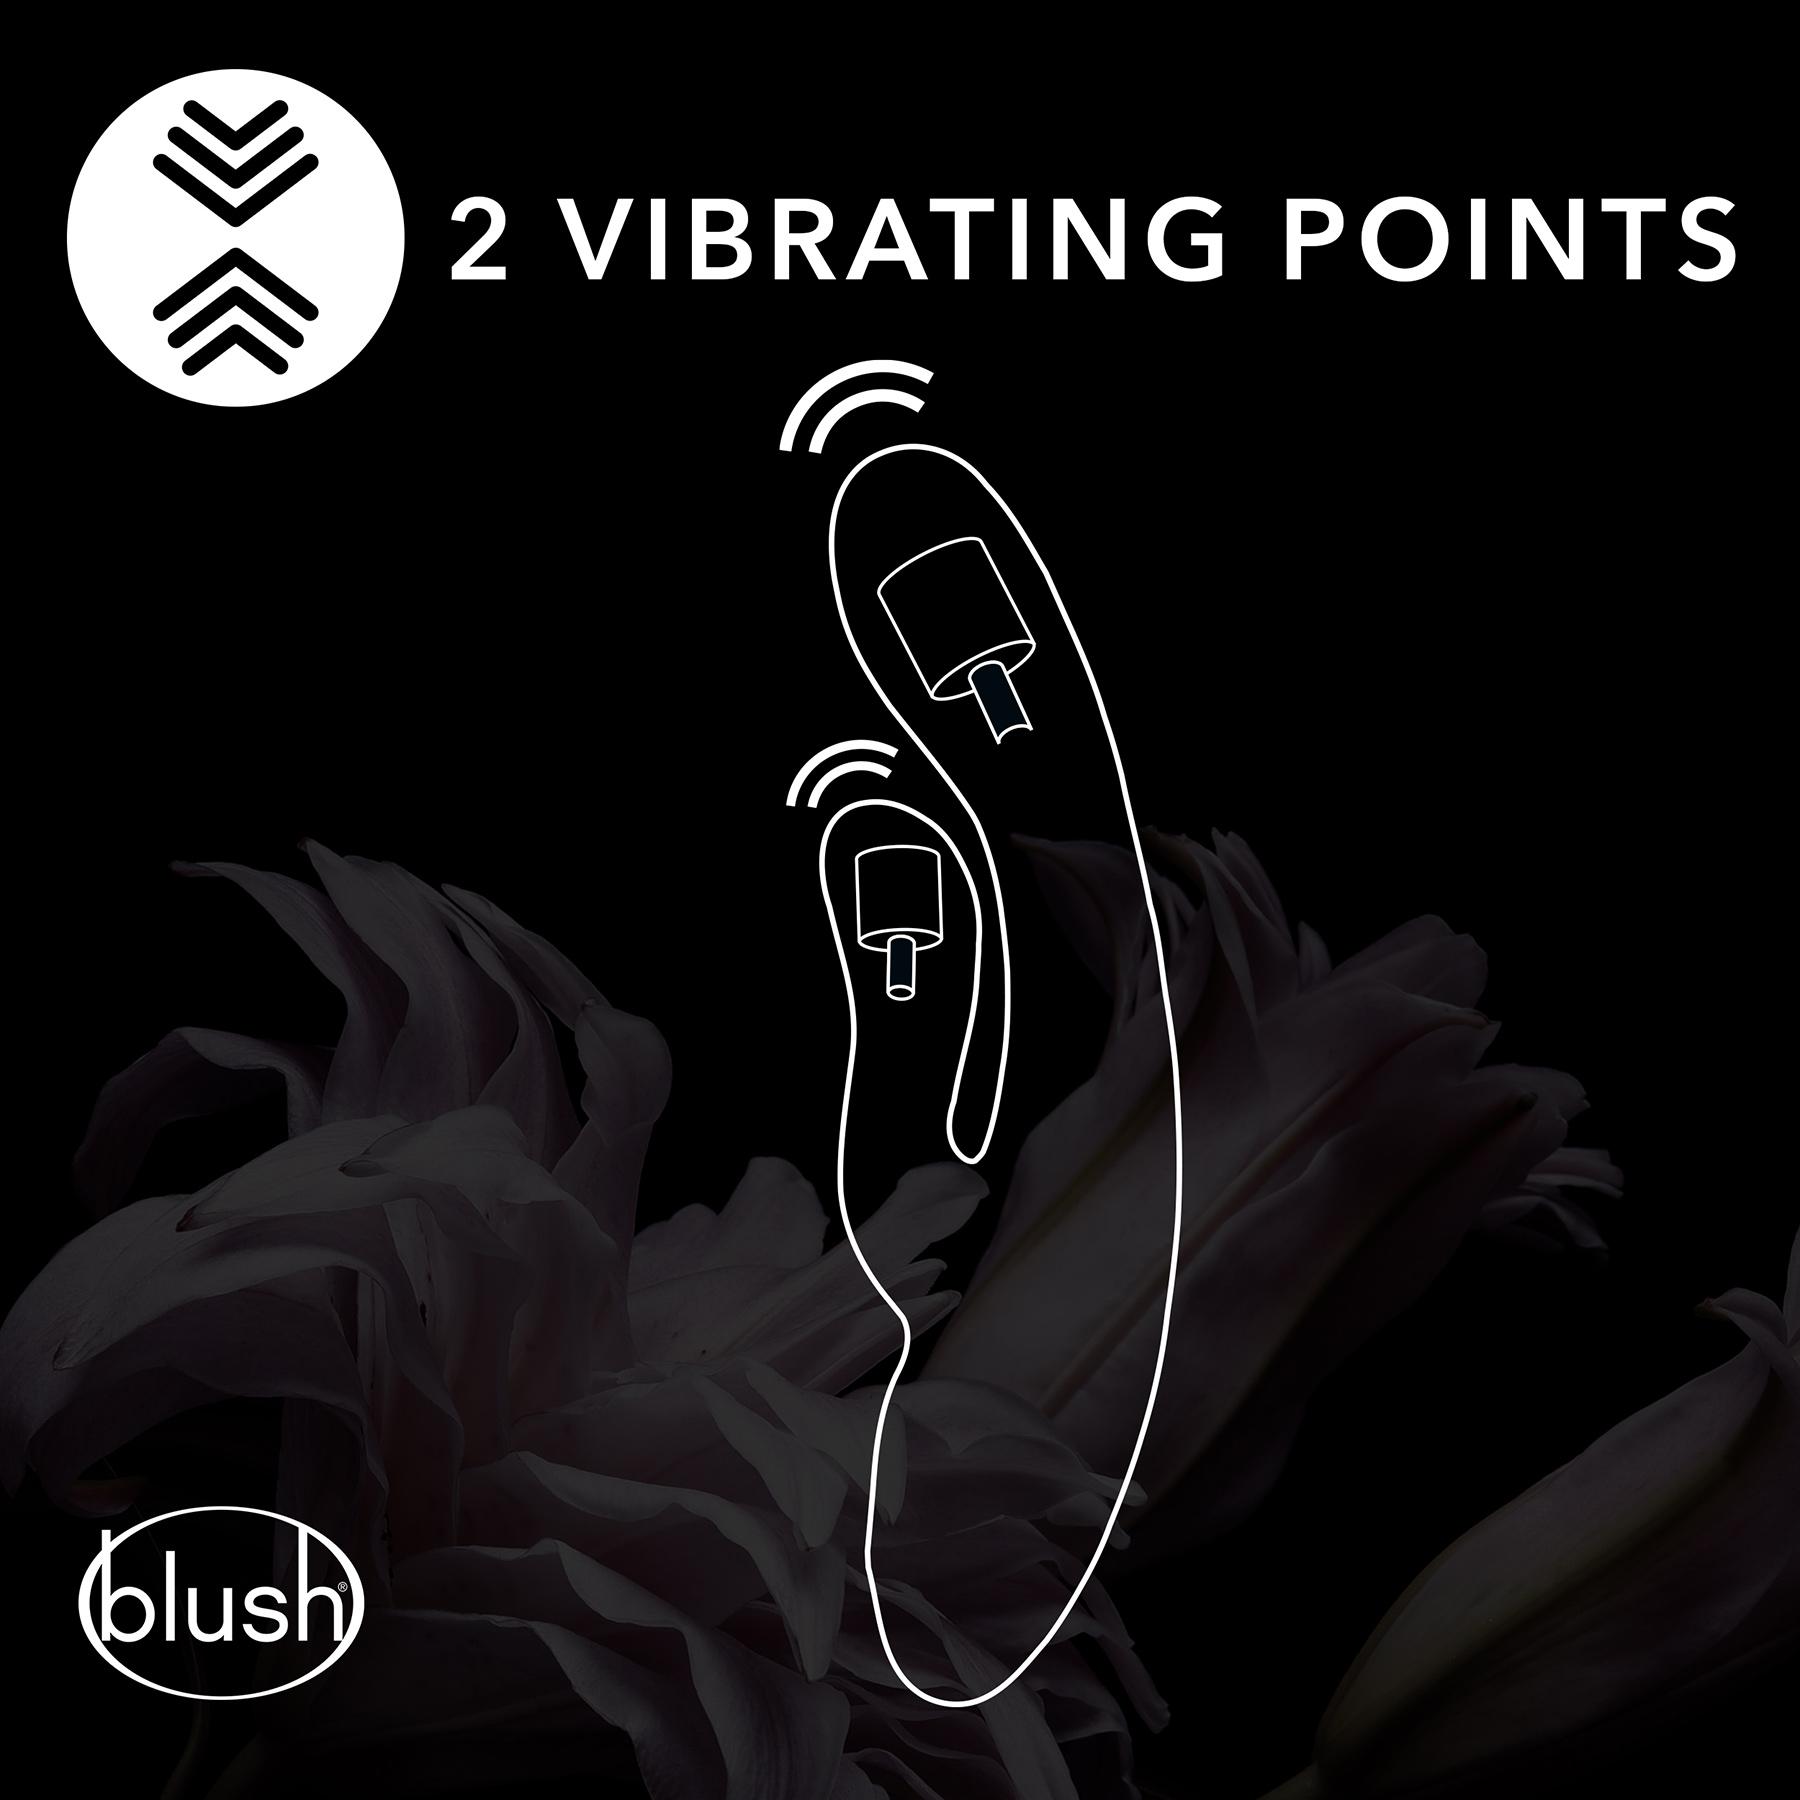 Hop Trix Silicone Dual Stimulation Vibrator - Vibrating Points